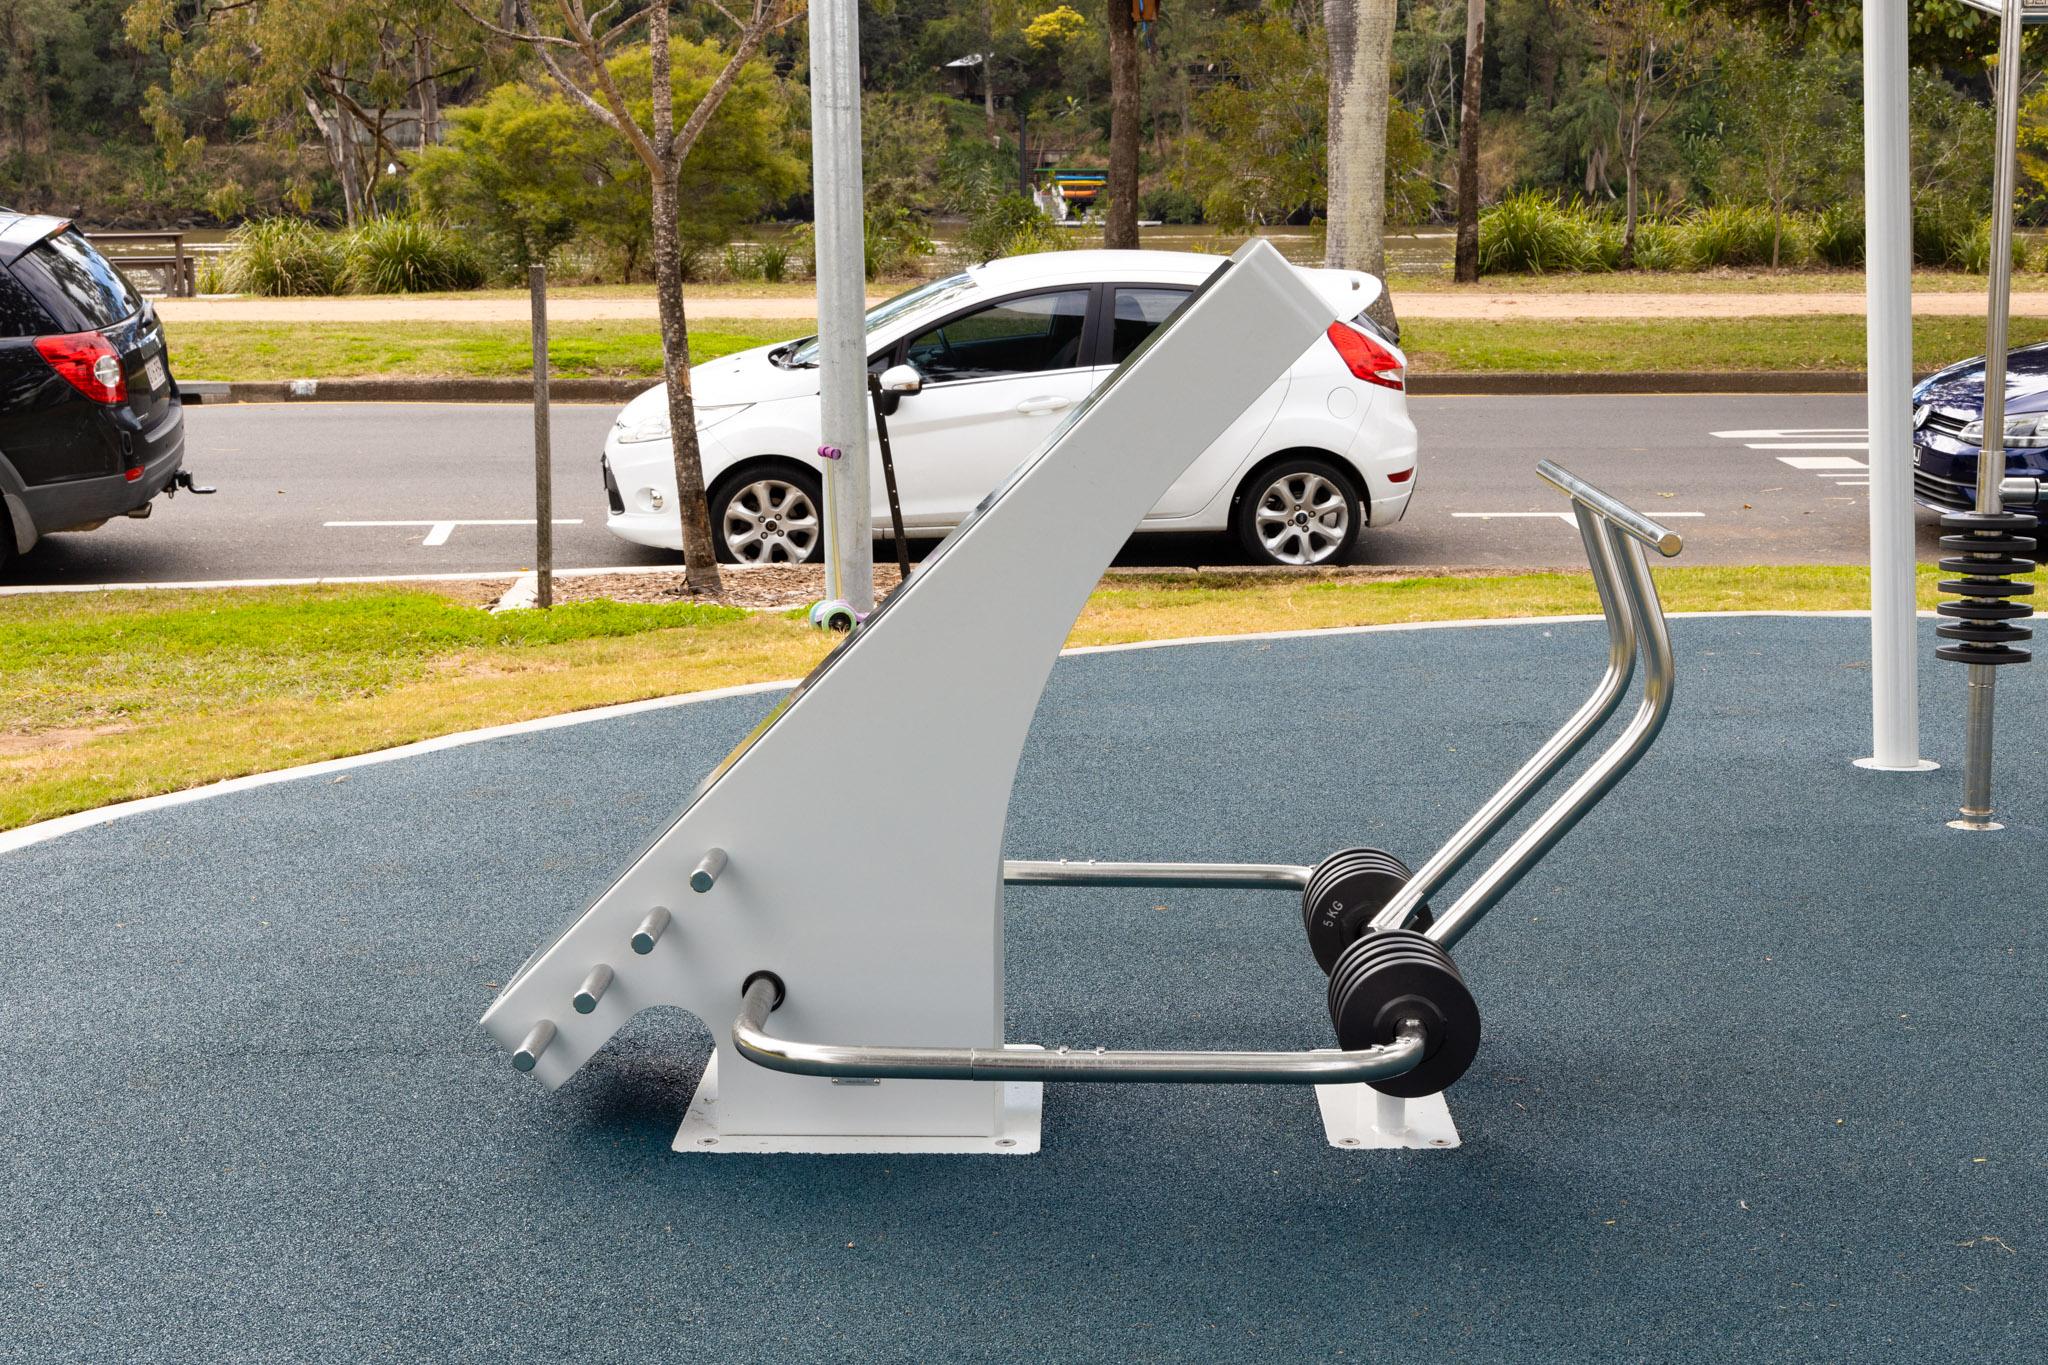 uq-outdoor-fitness-austek-play-brisbane-03